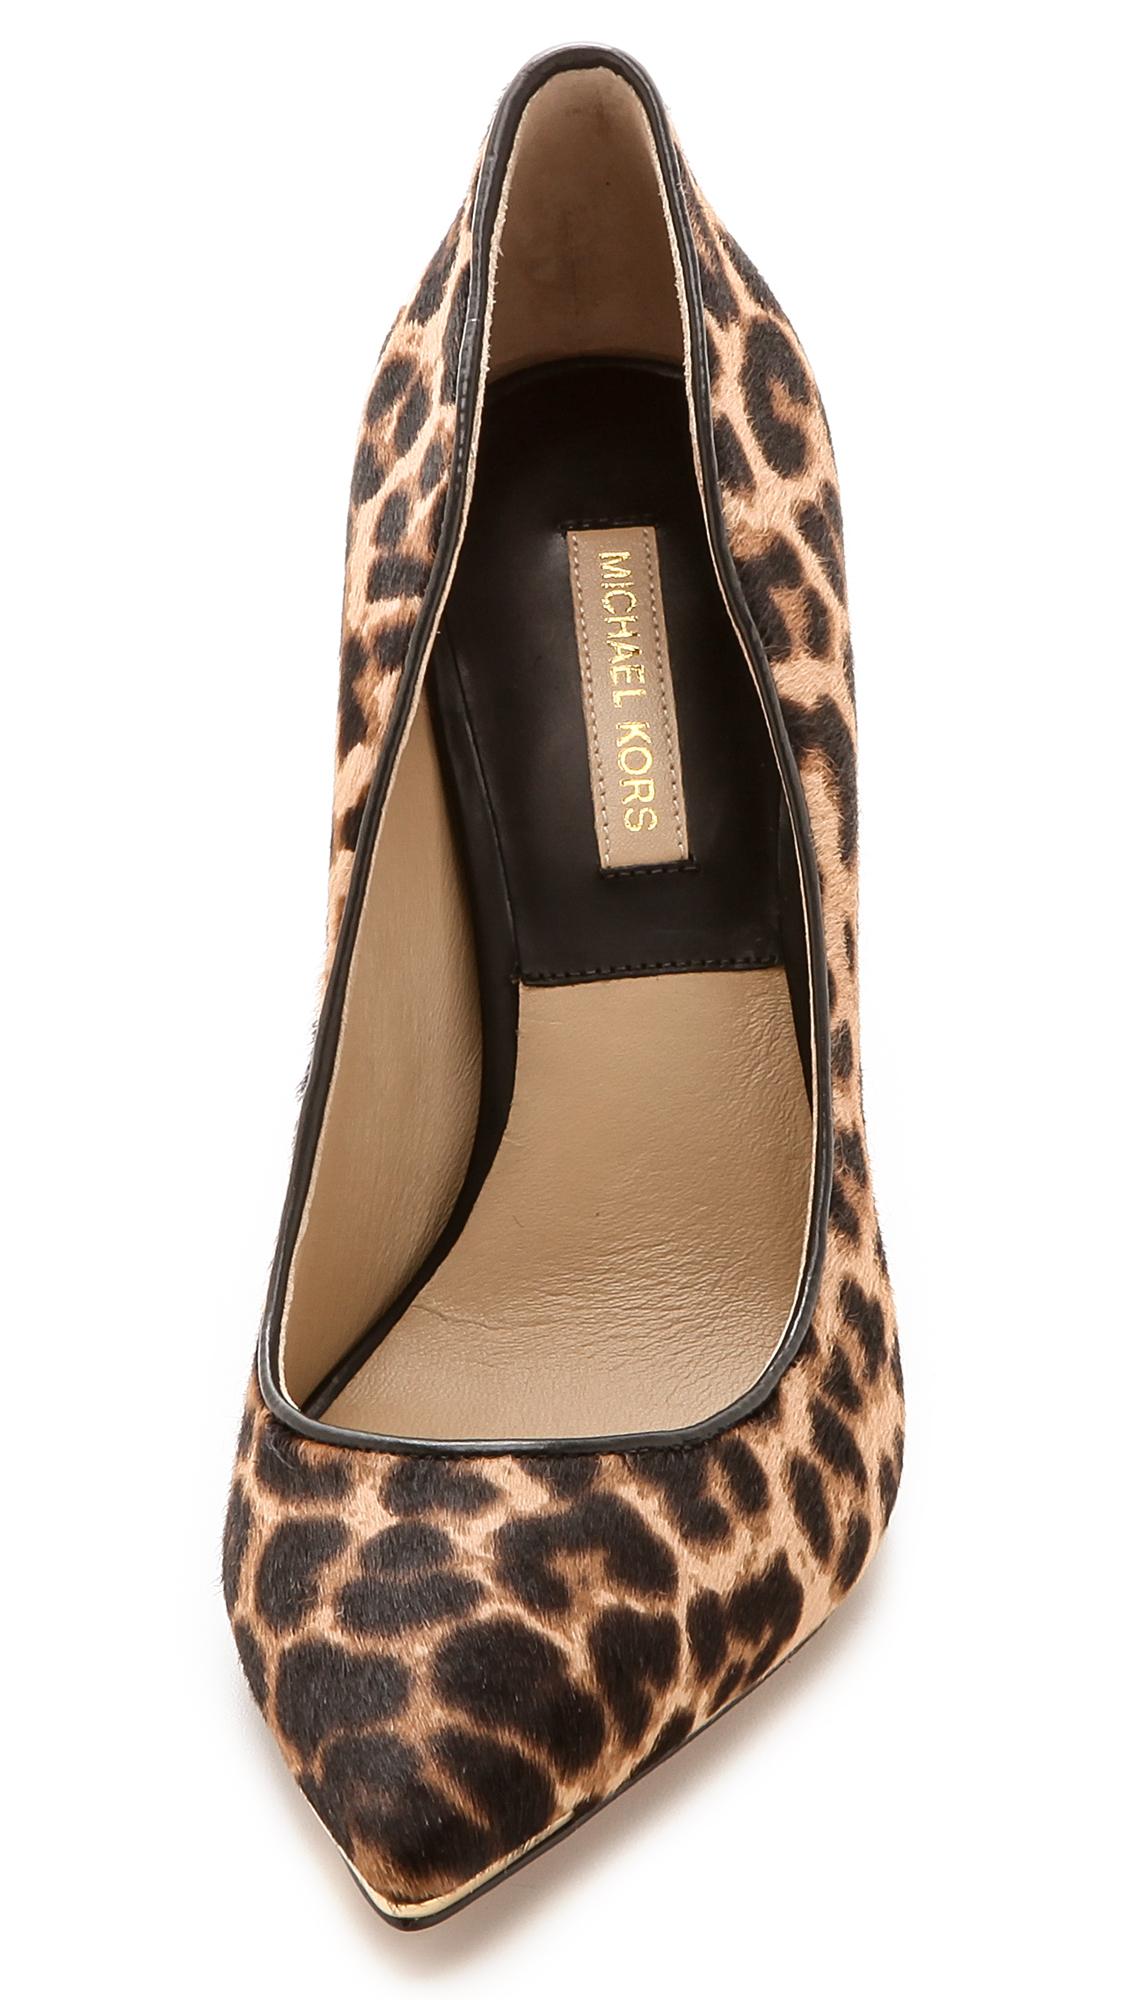 Michael kors collection avra leopard haircalf pumps